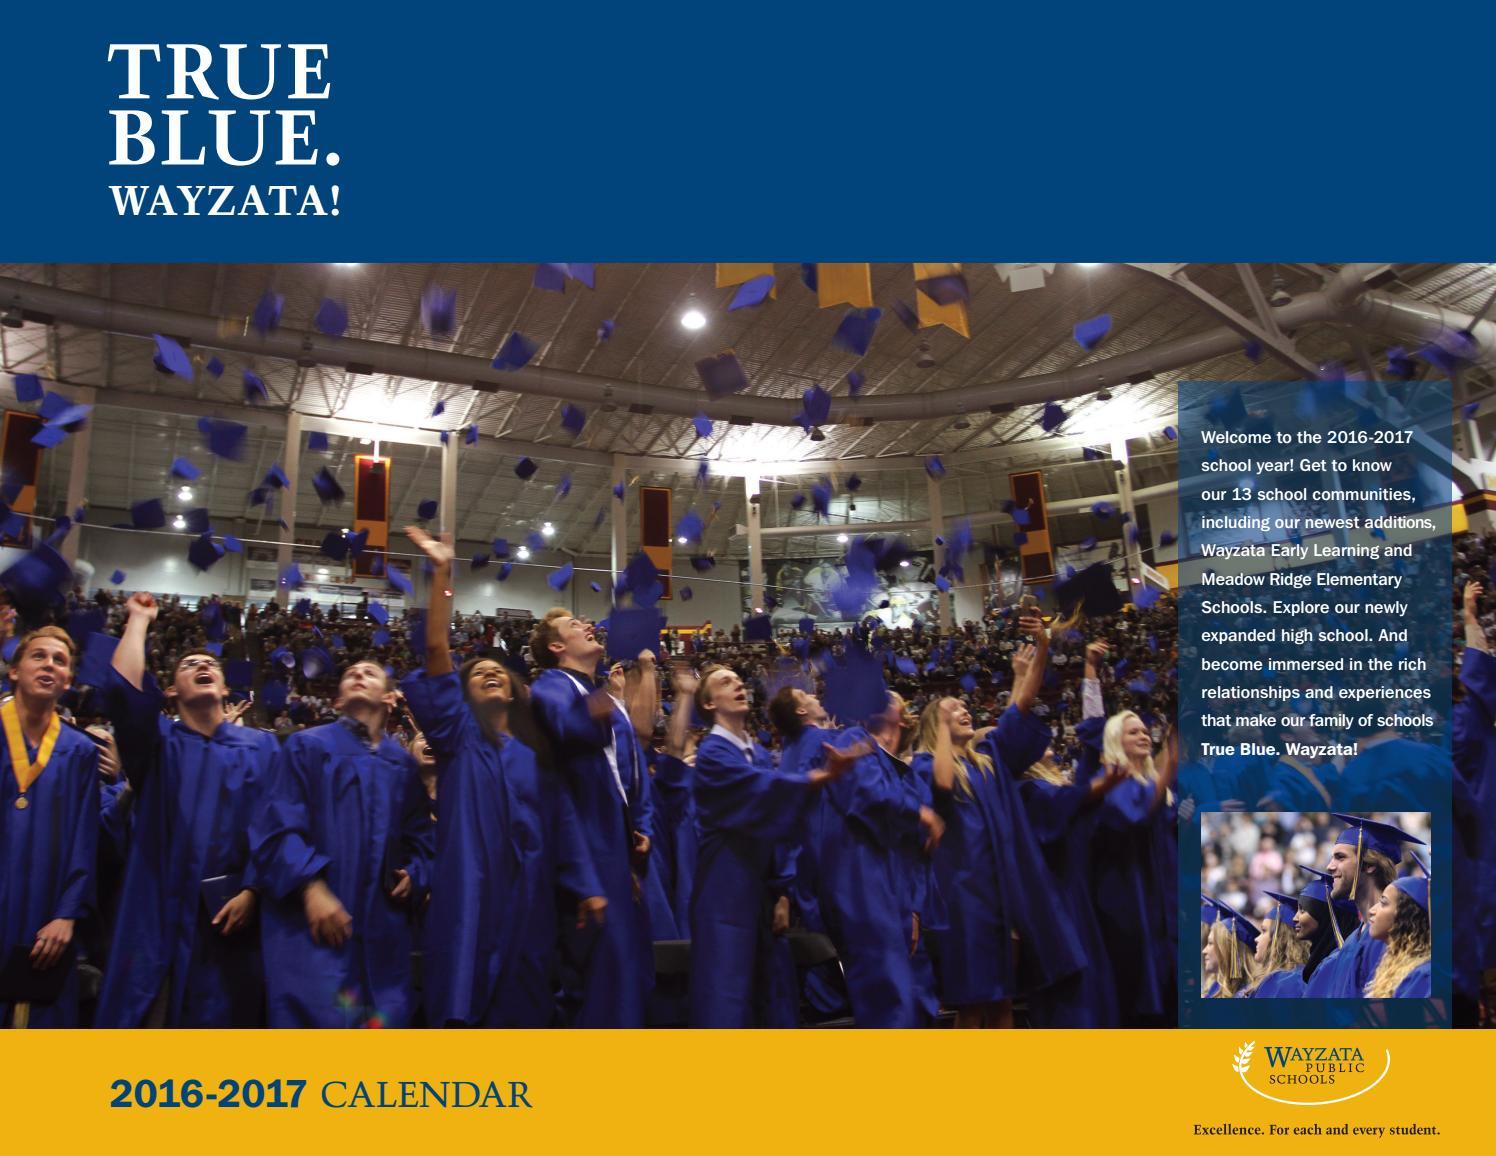 2016 2017 Wayzata Public Schools Calendar By Wayzata